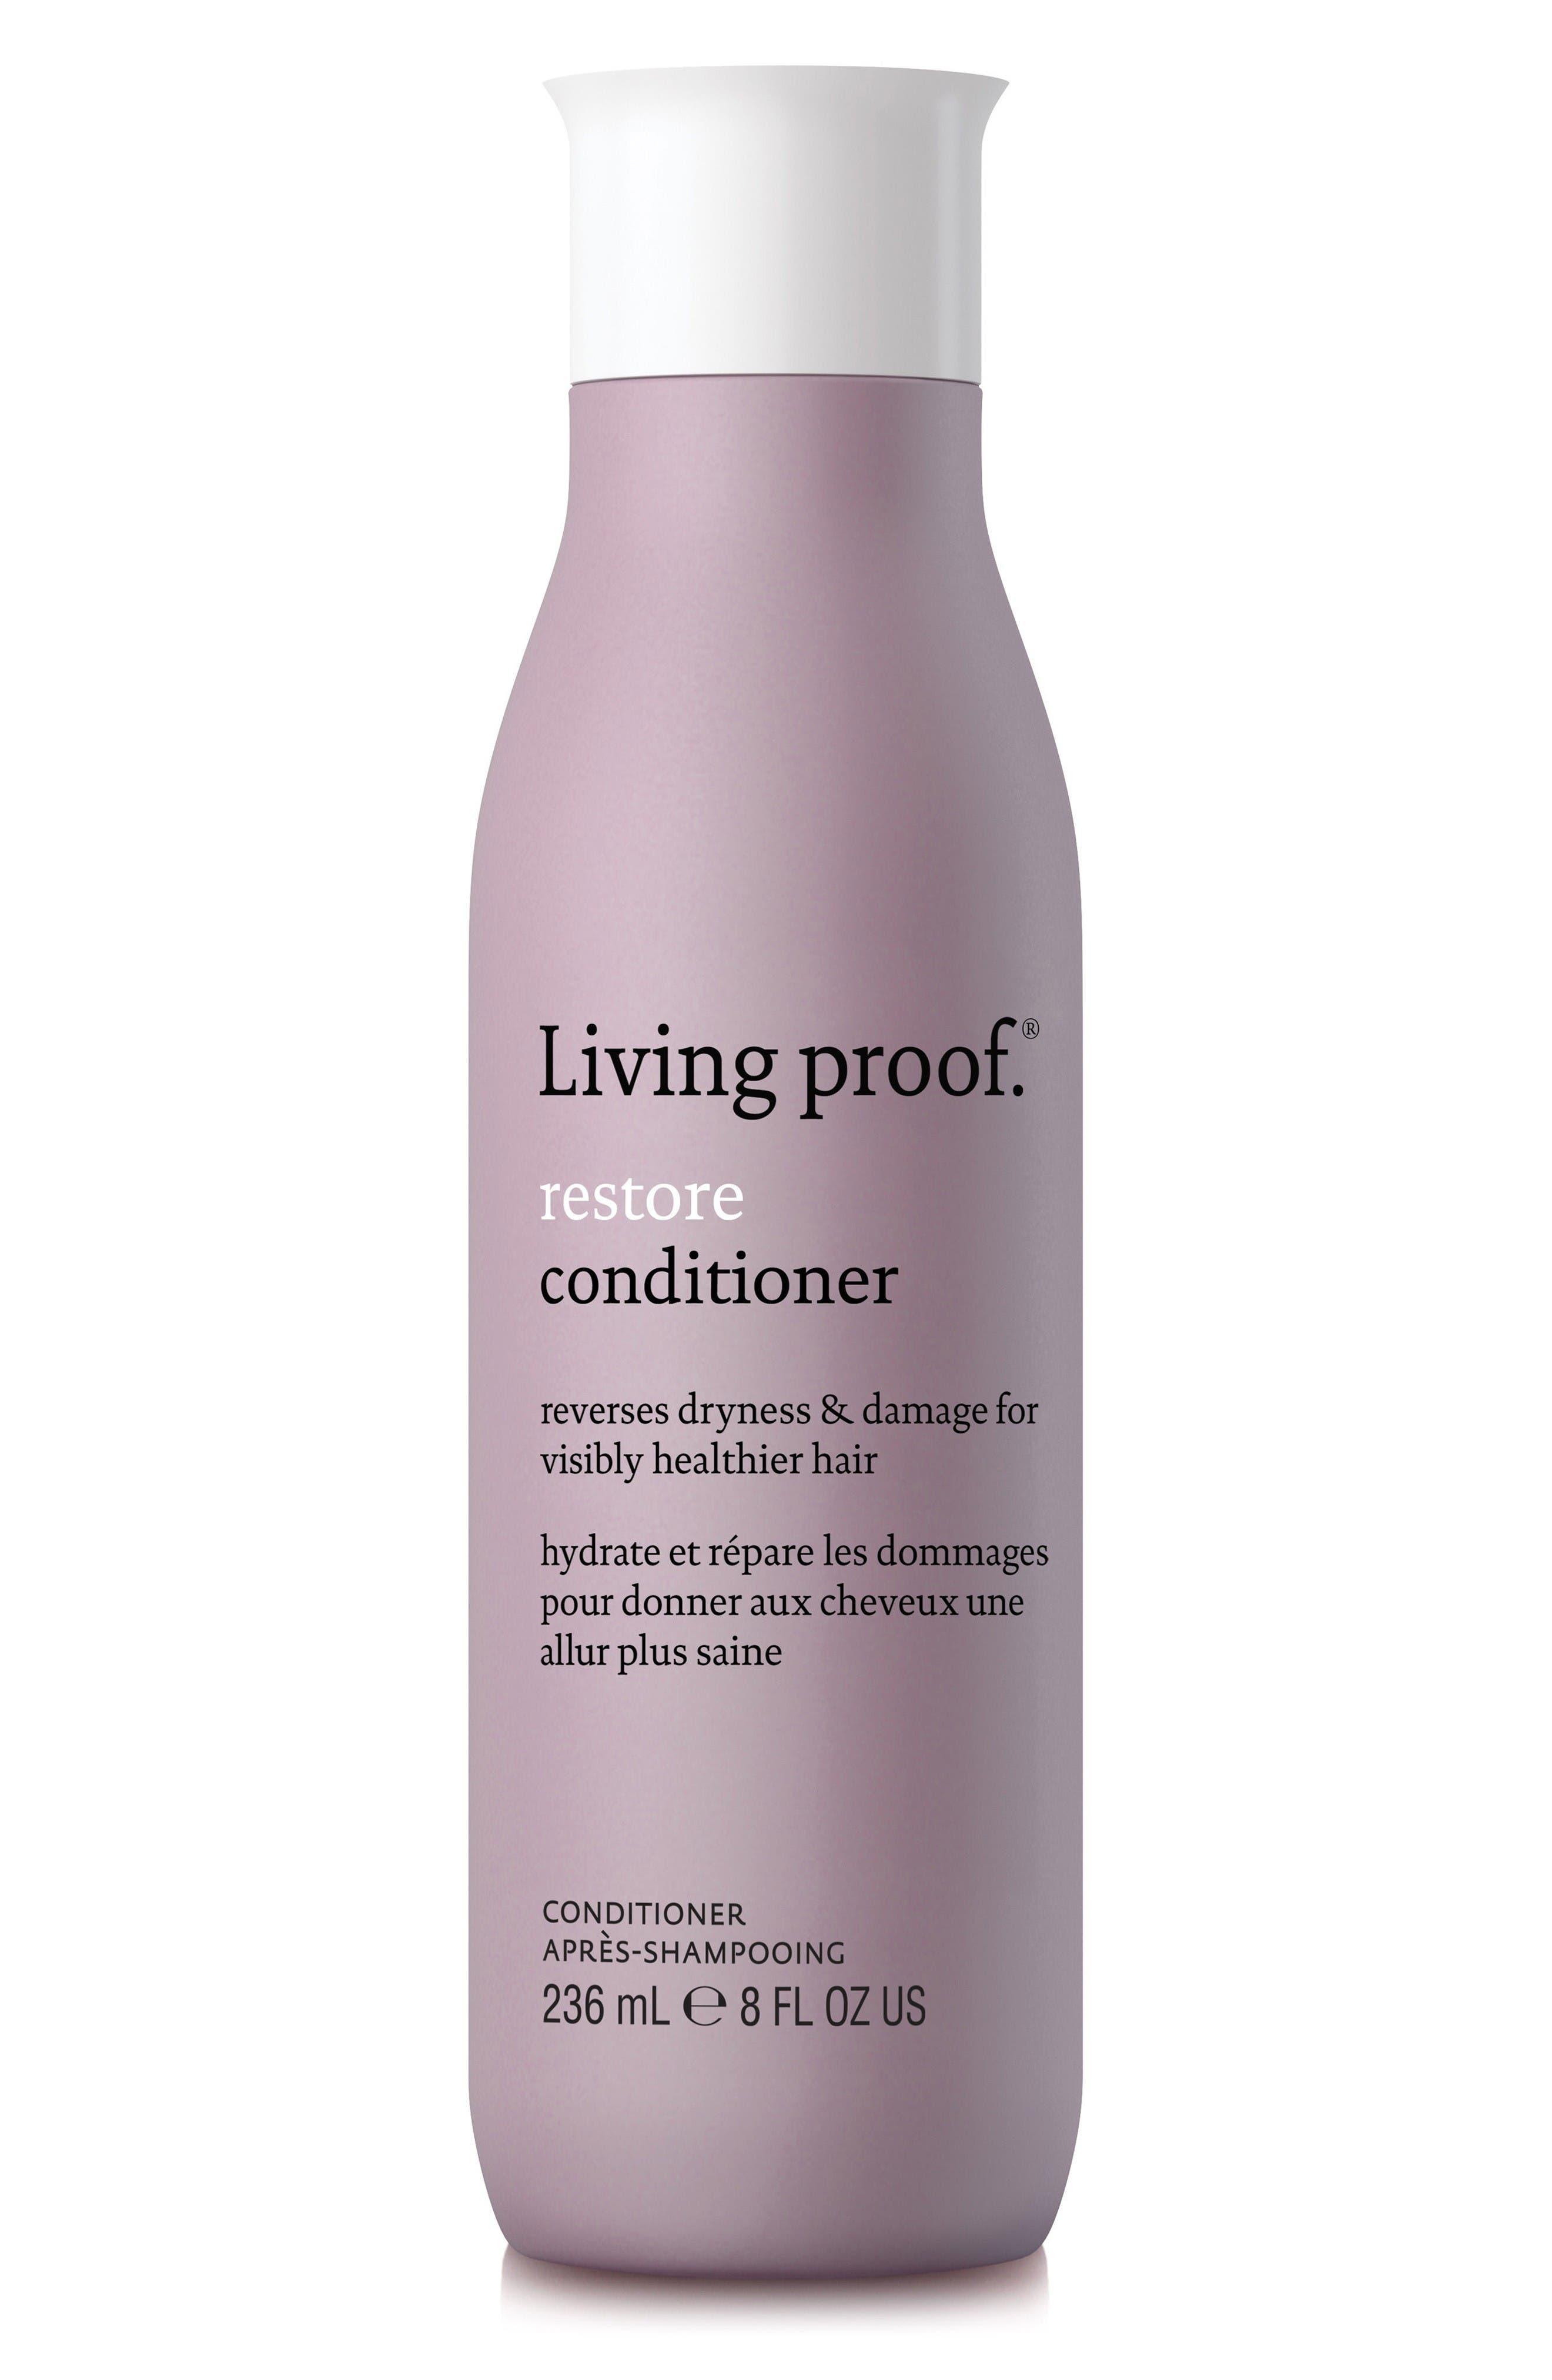 Living proof® Restore Conditioner